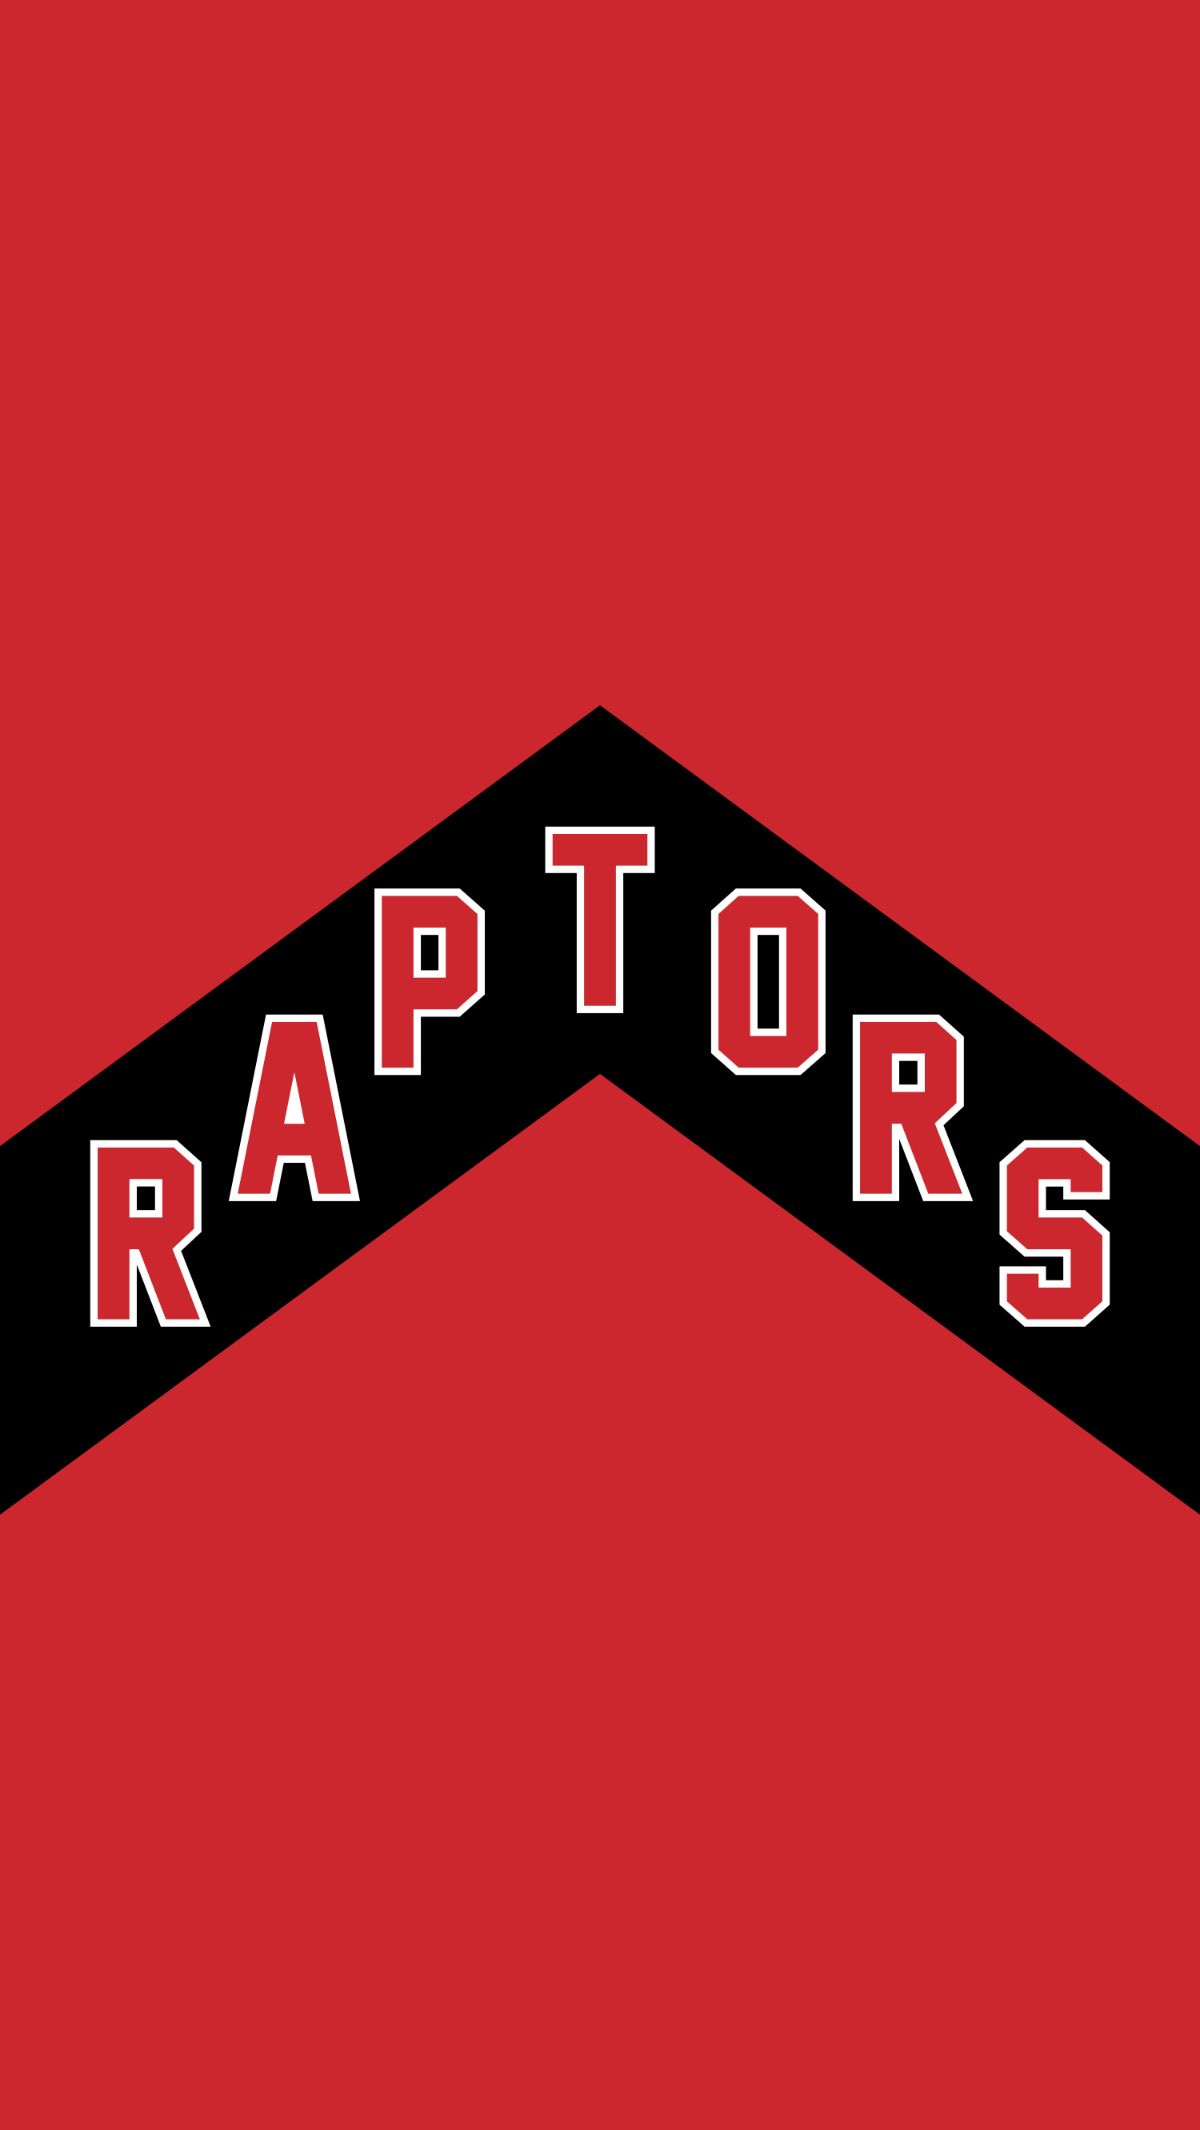 Raptors Toronto Basketball City Sticker By Sportsign Toronto Raptors Basketball Toronto Raptors Raptors